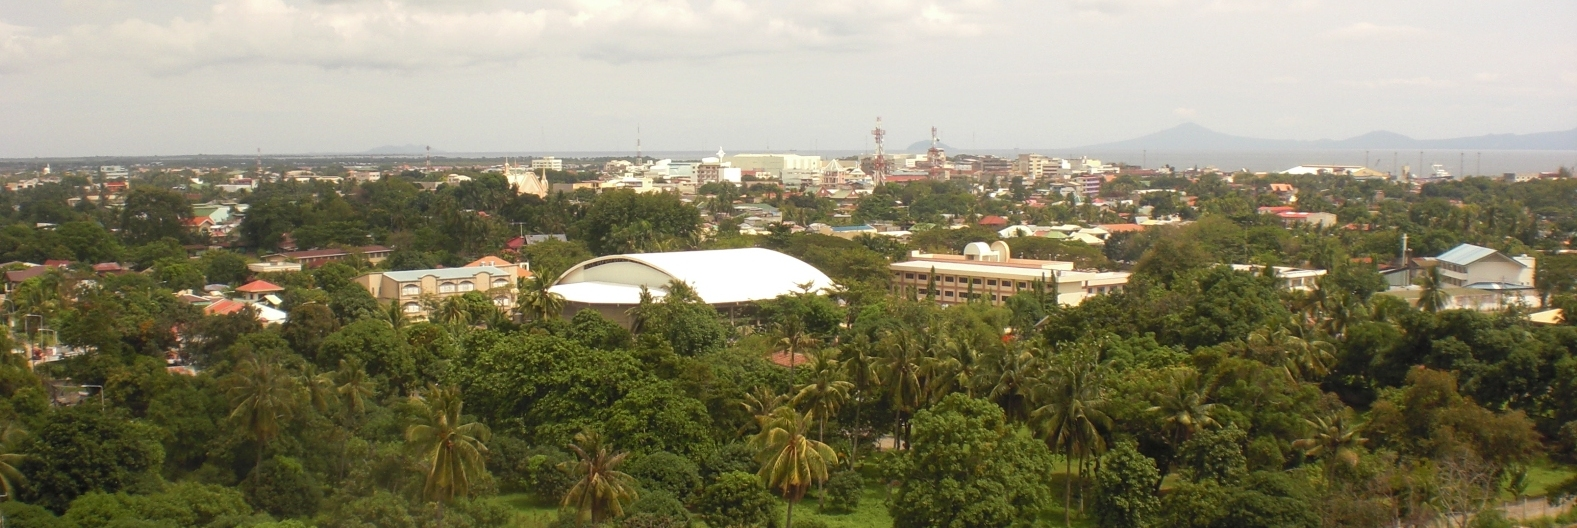 Zamboanga City from Garden Orchid Hotel.jpg